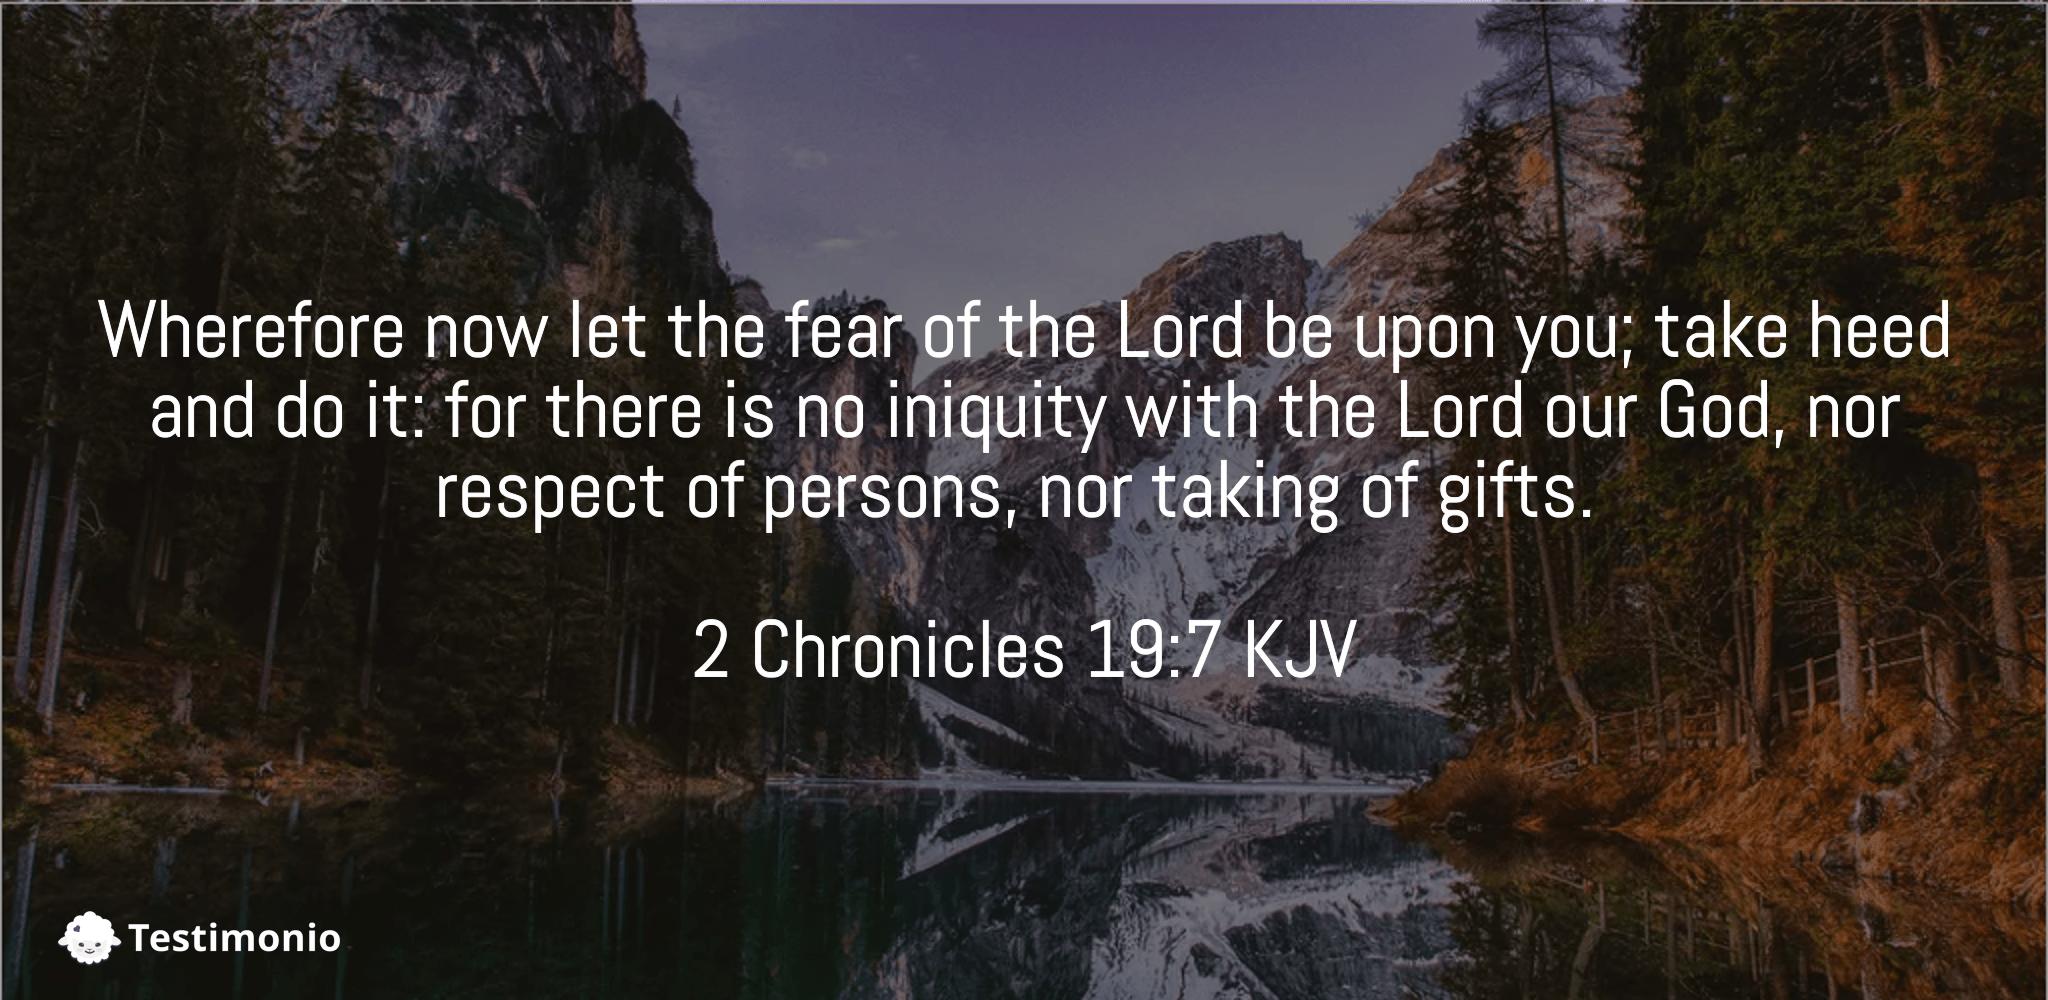 2 Chronicles 19:7